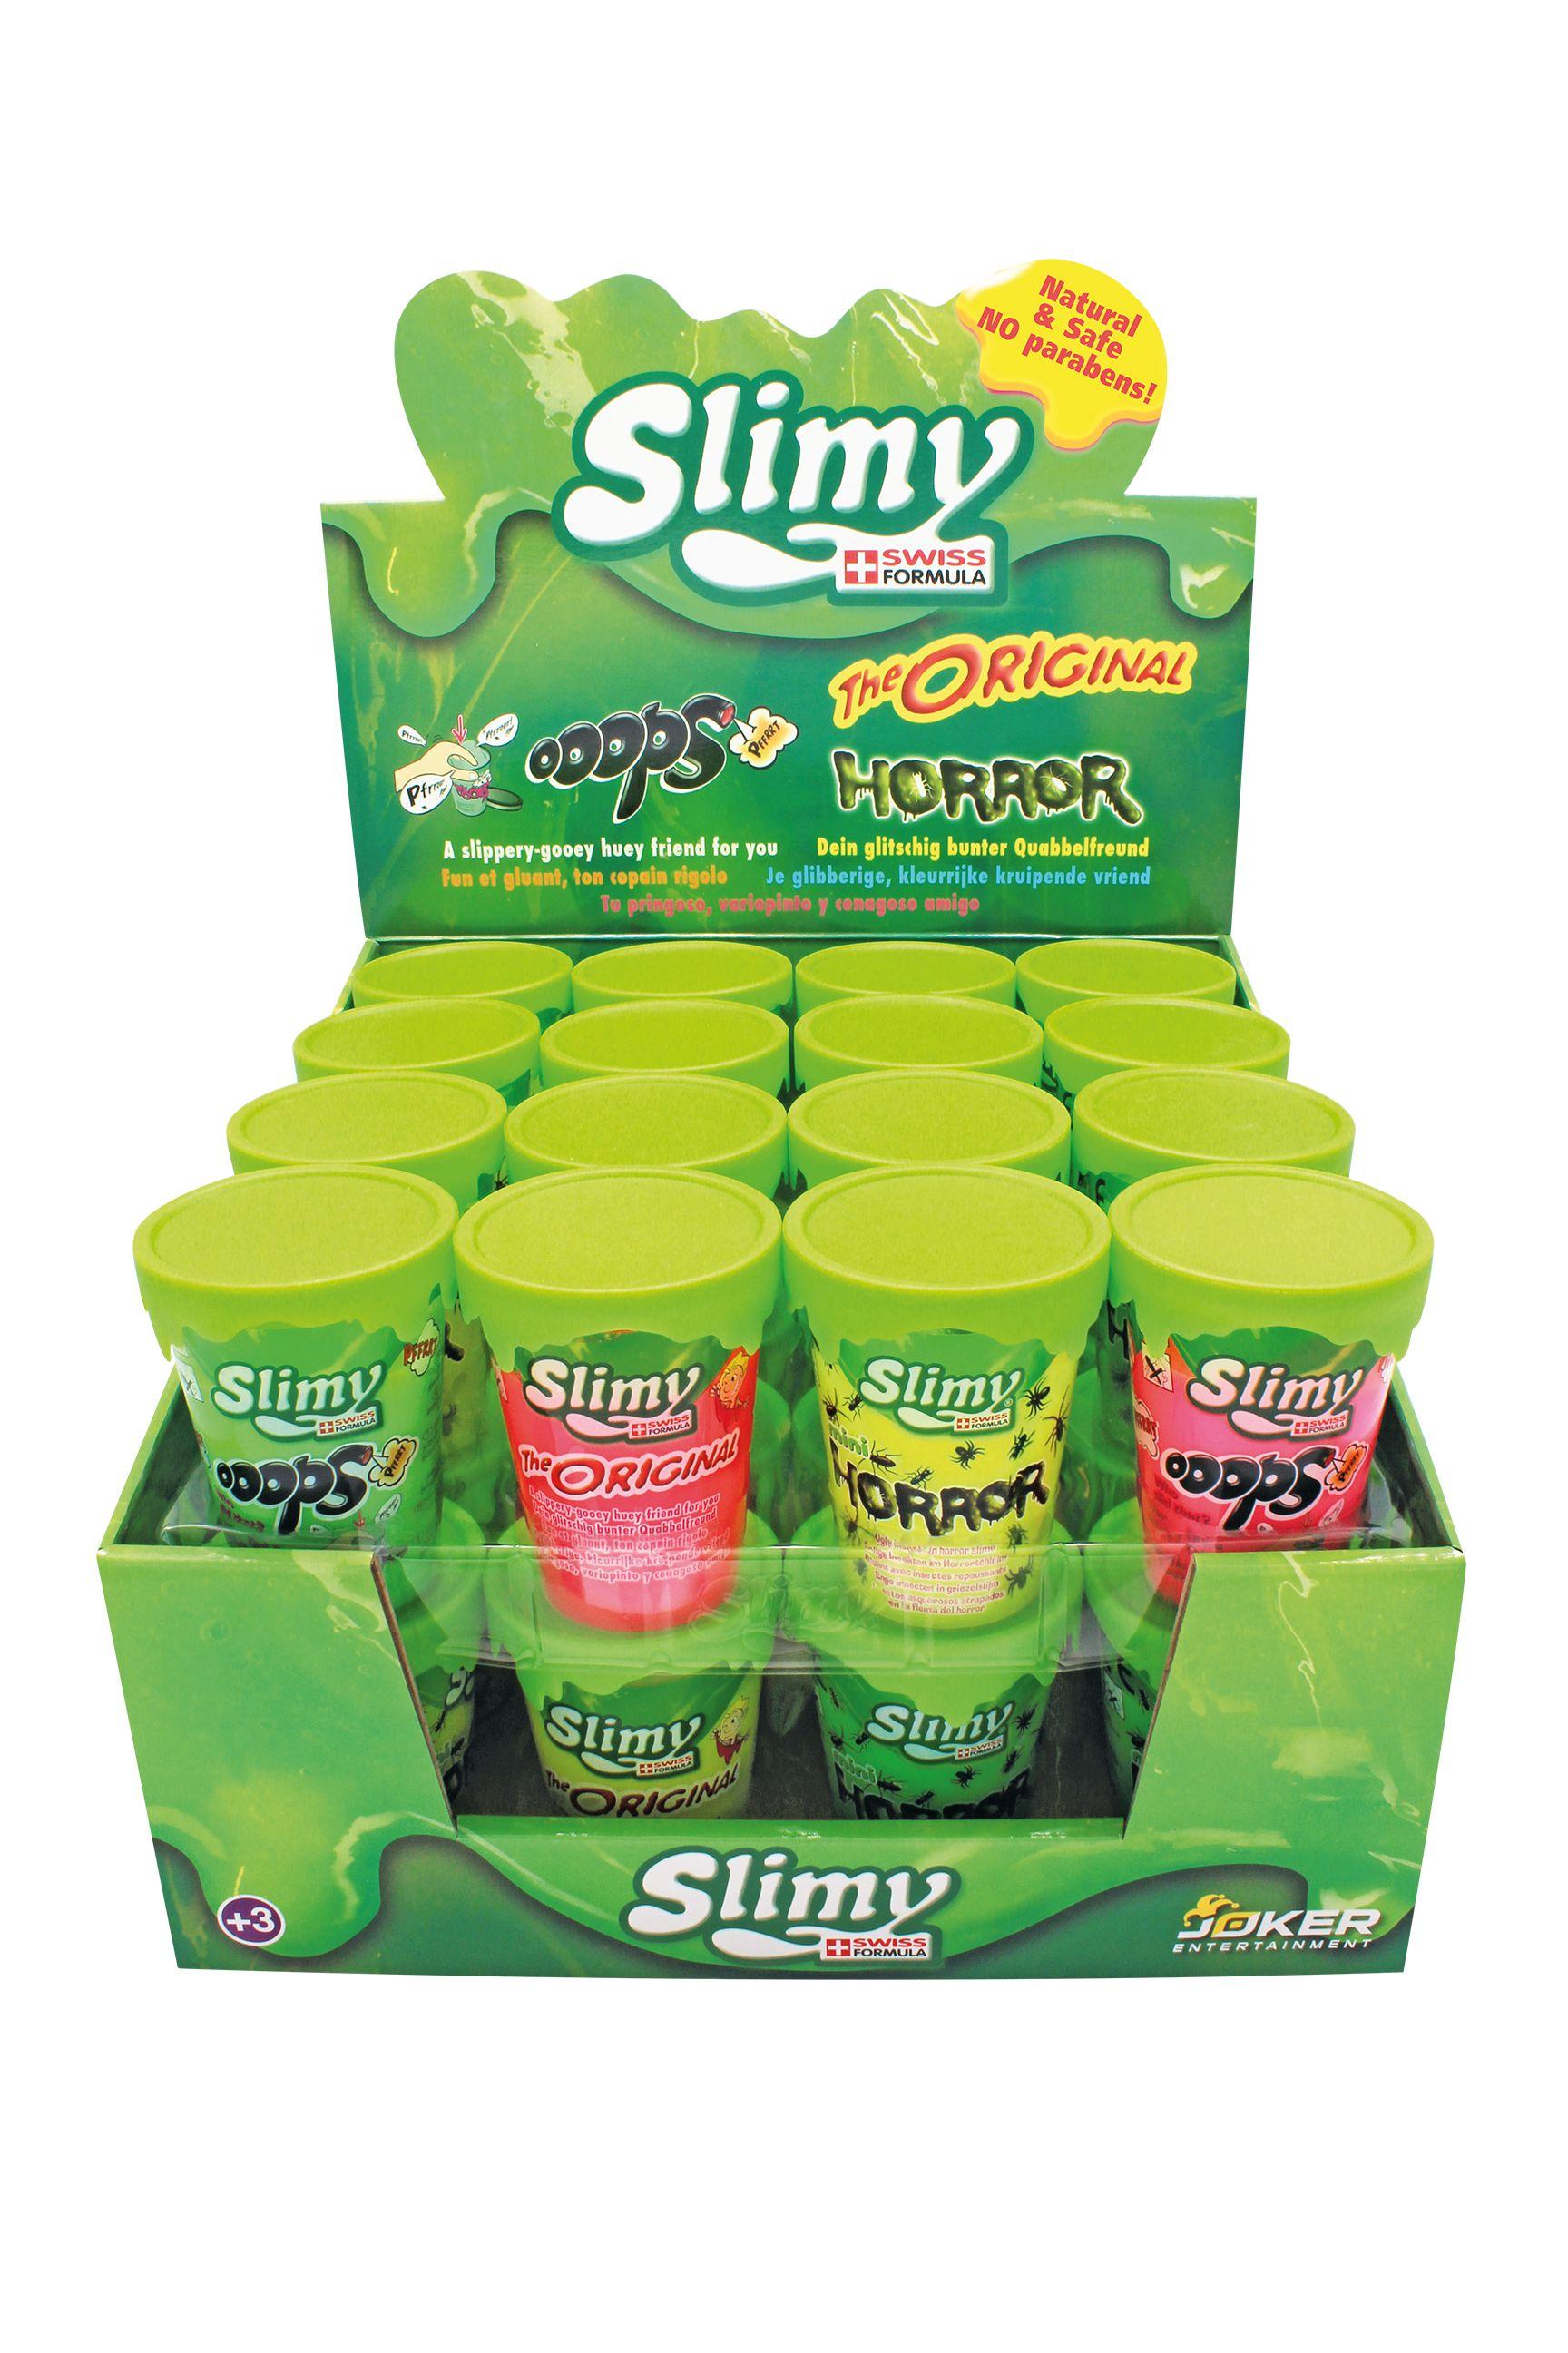 SLIMY Mini Original, Horror & Ooops